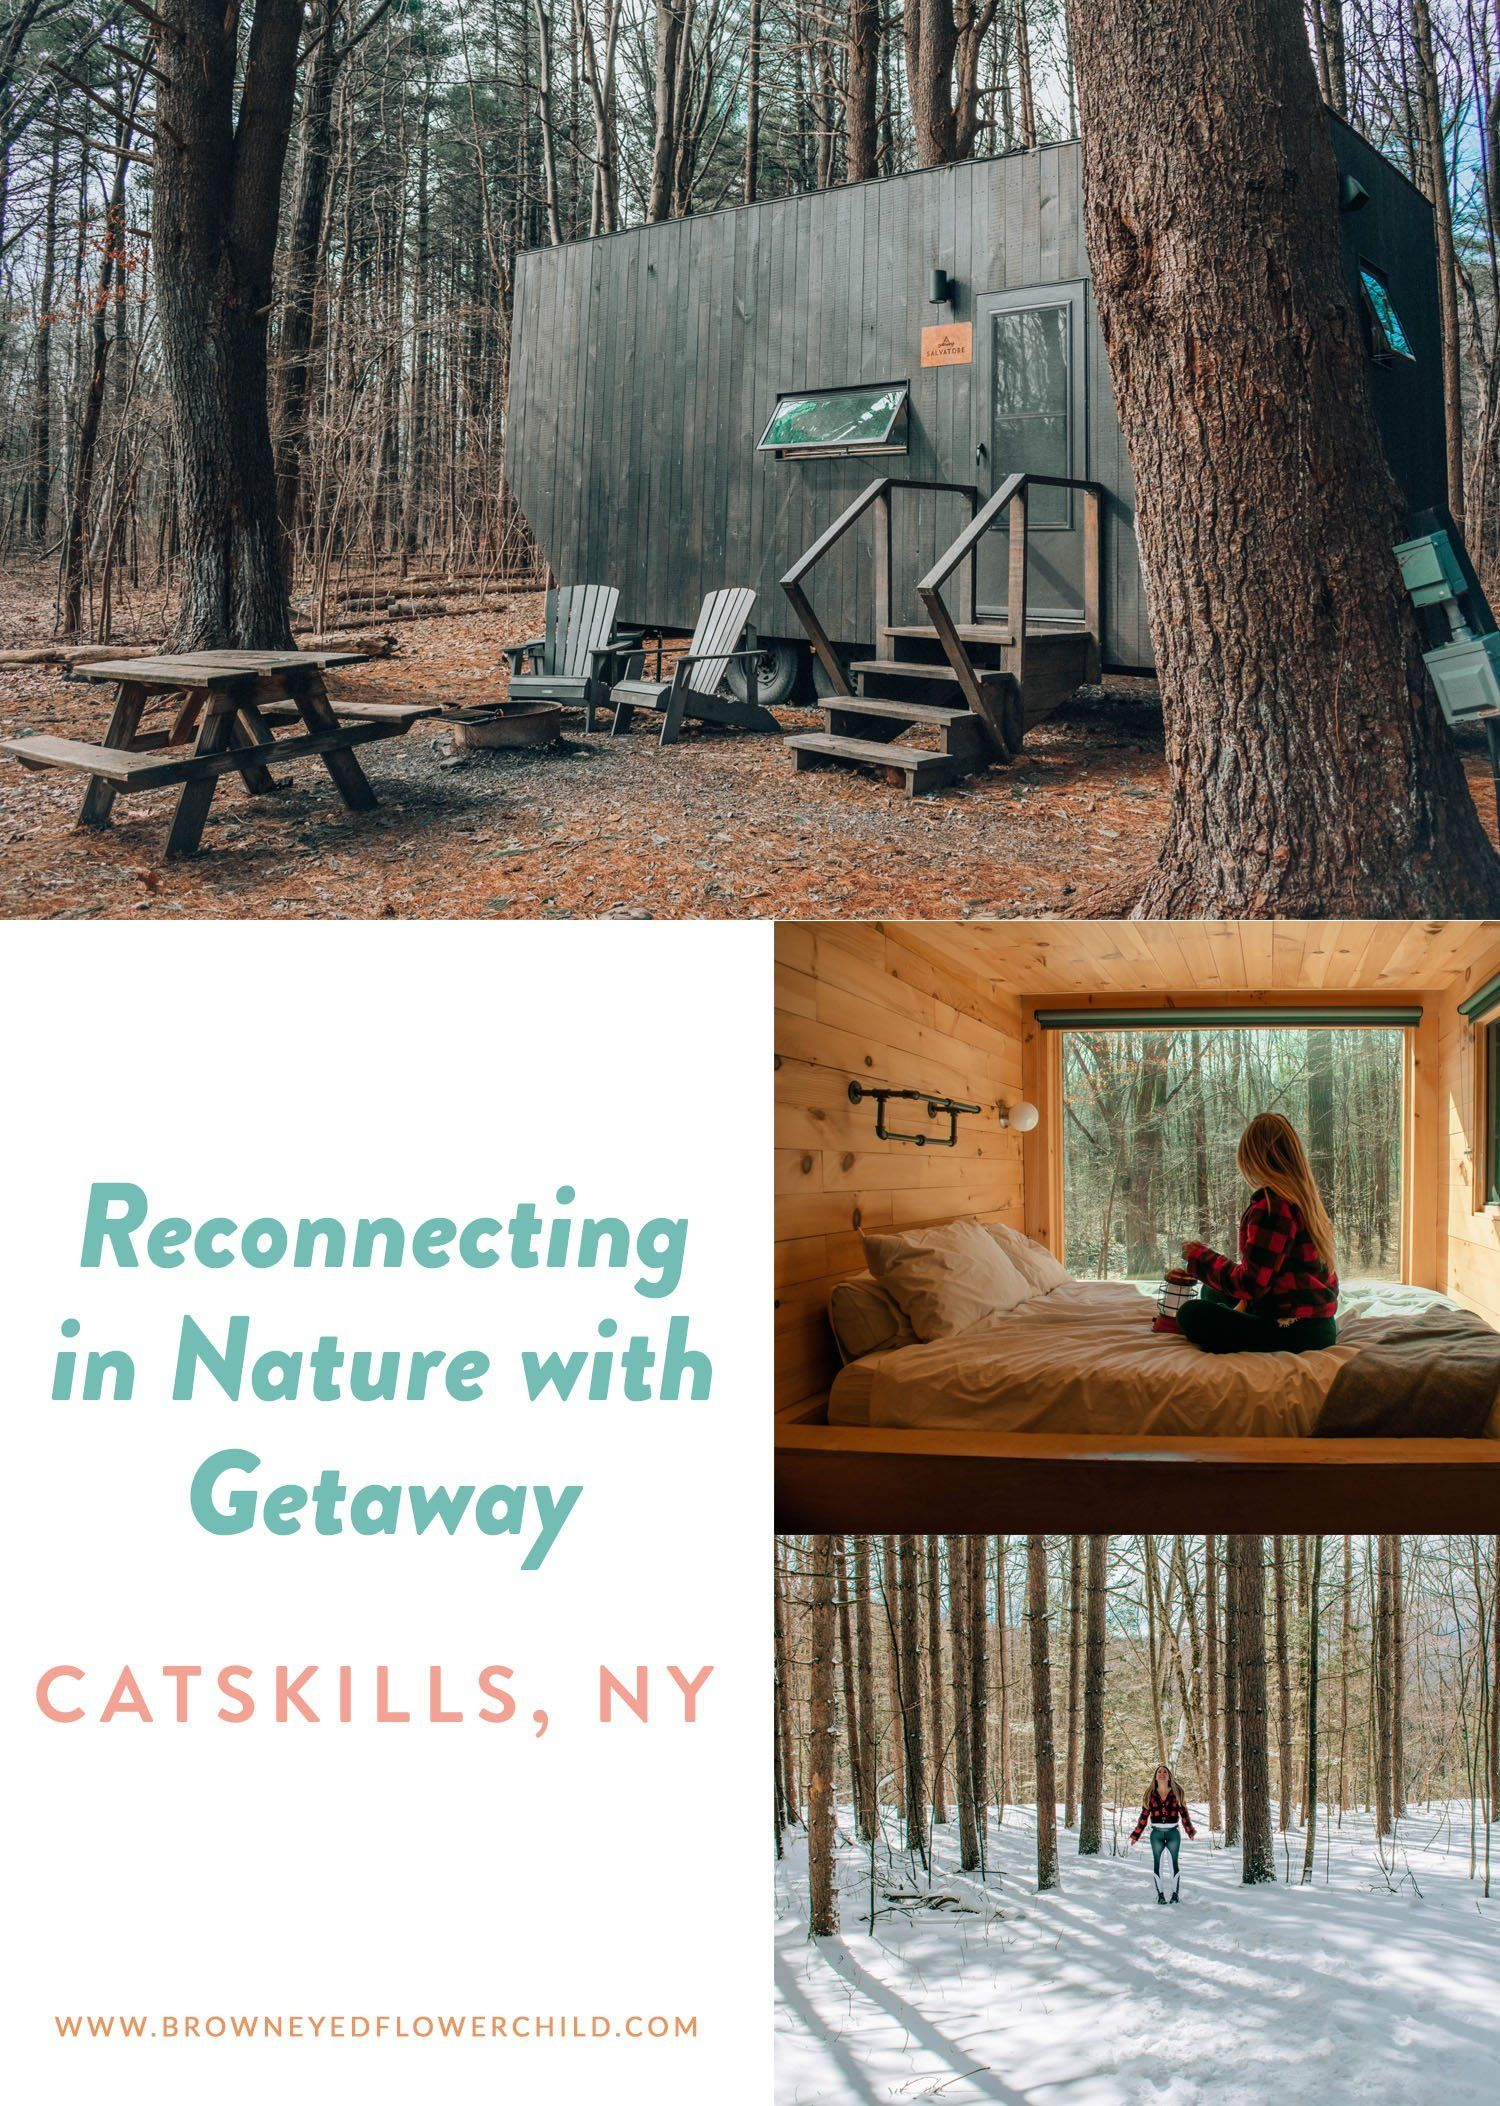 Reconnecting in the New York Catskills with Getaway #GetawayHouse #Getaway #NYCatskills #UpstateNewYork #Glamping